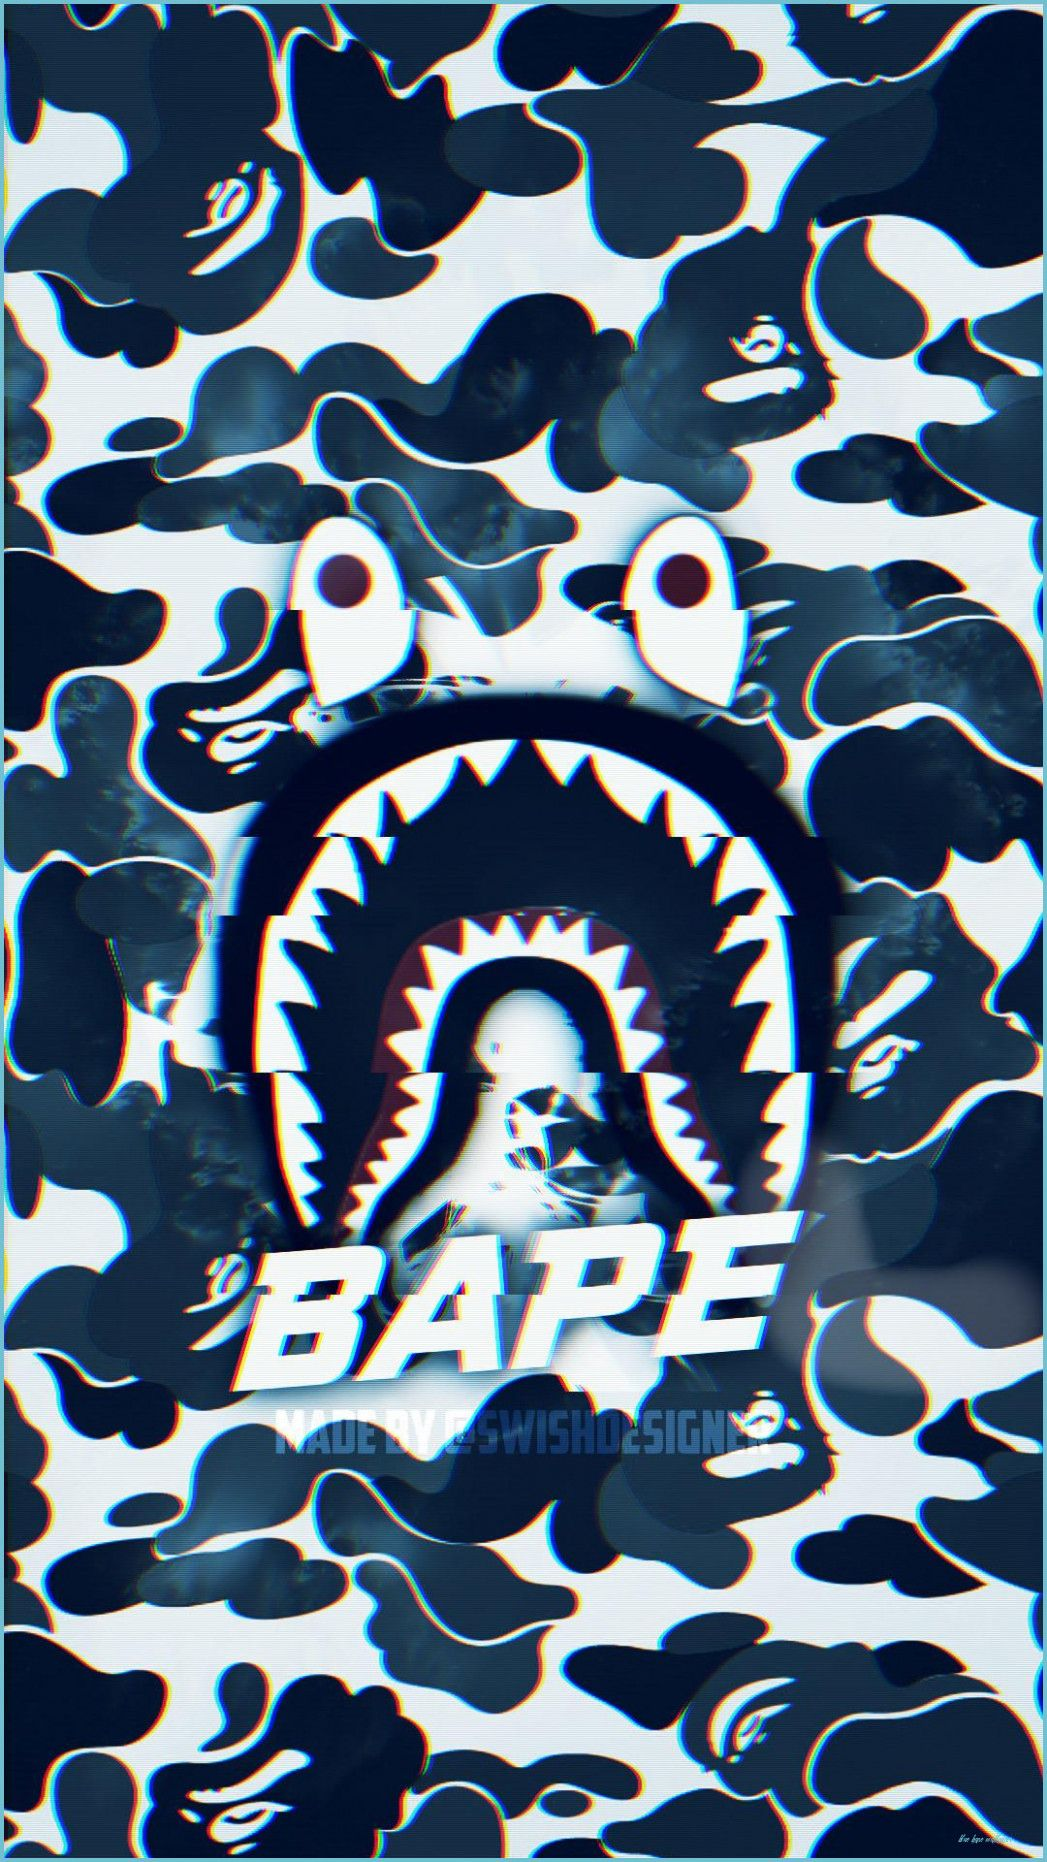 Bape Shark Wallpapers Wallpaper Cave Blue Bape Wallpaper In 2020 Bape Wallpapers Bape Shark Wallpaper Bape Wallpaper Iphone